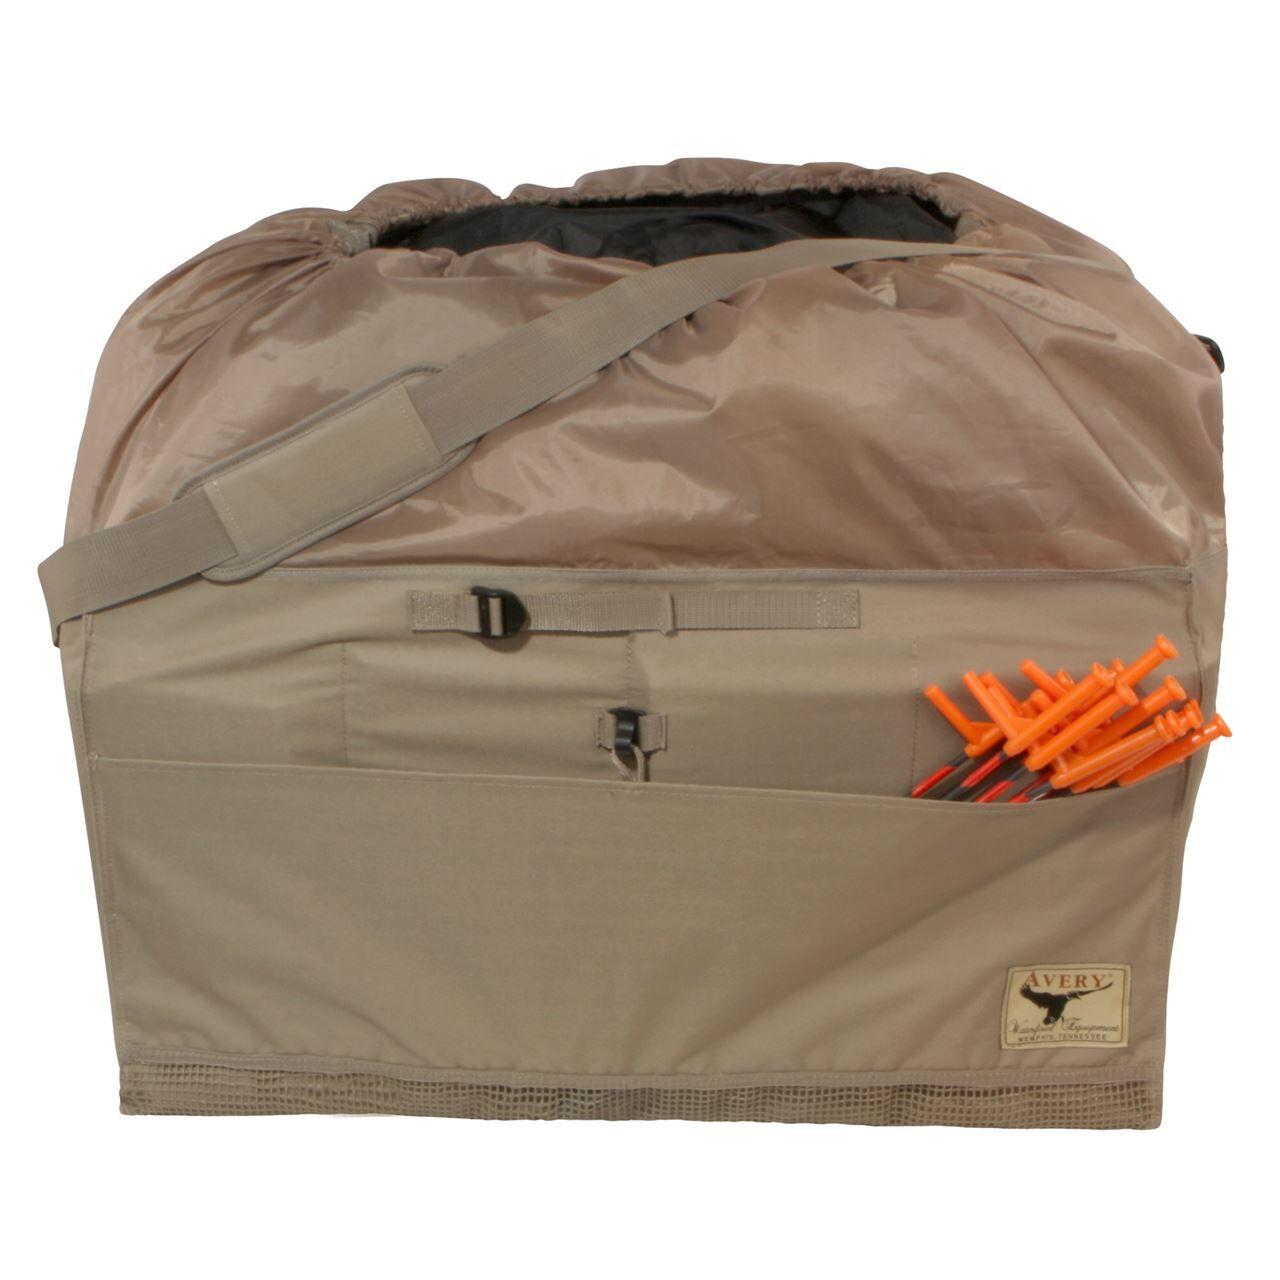 Avery Outdoors 12-Slot Mid-Size Full Body Goose Bag - Khaki